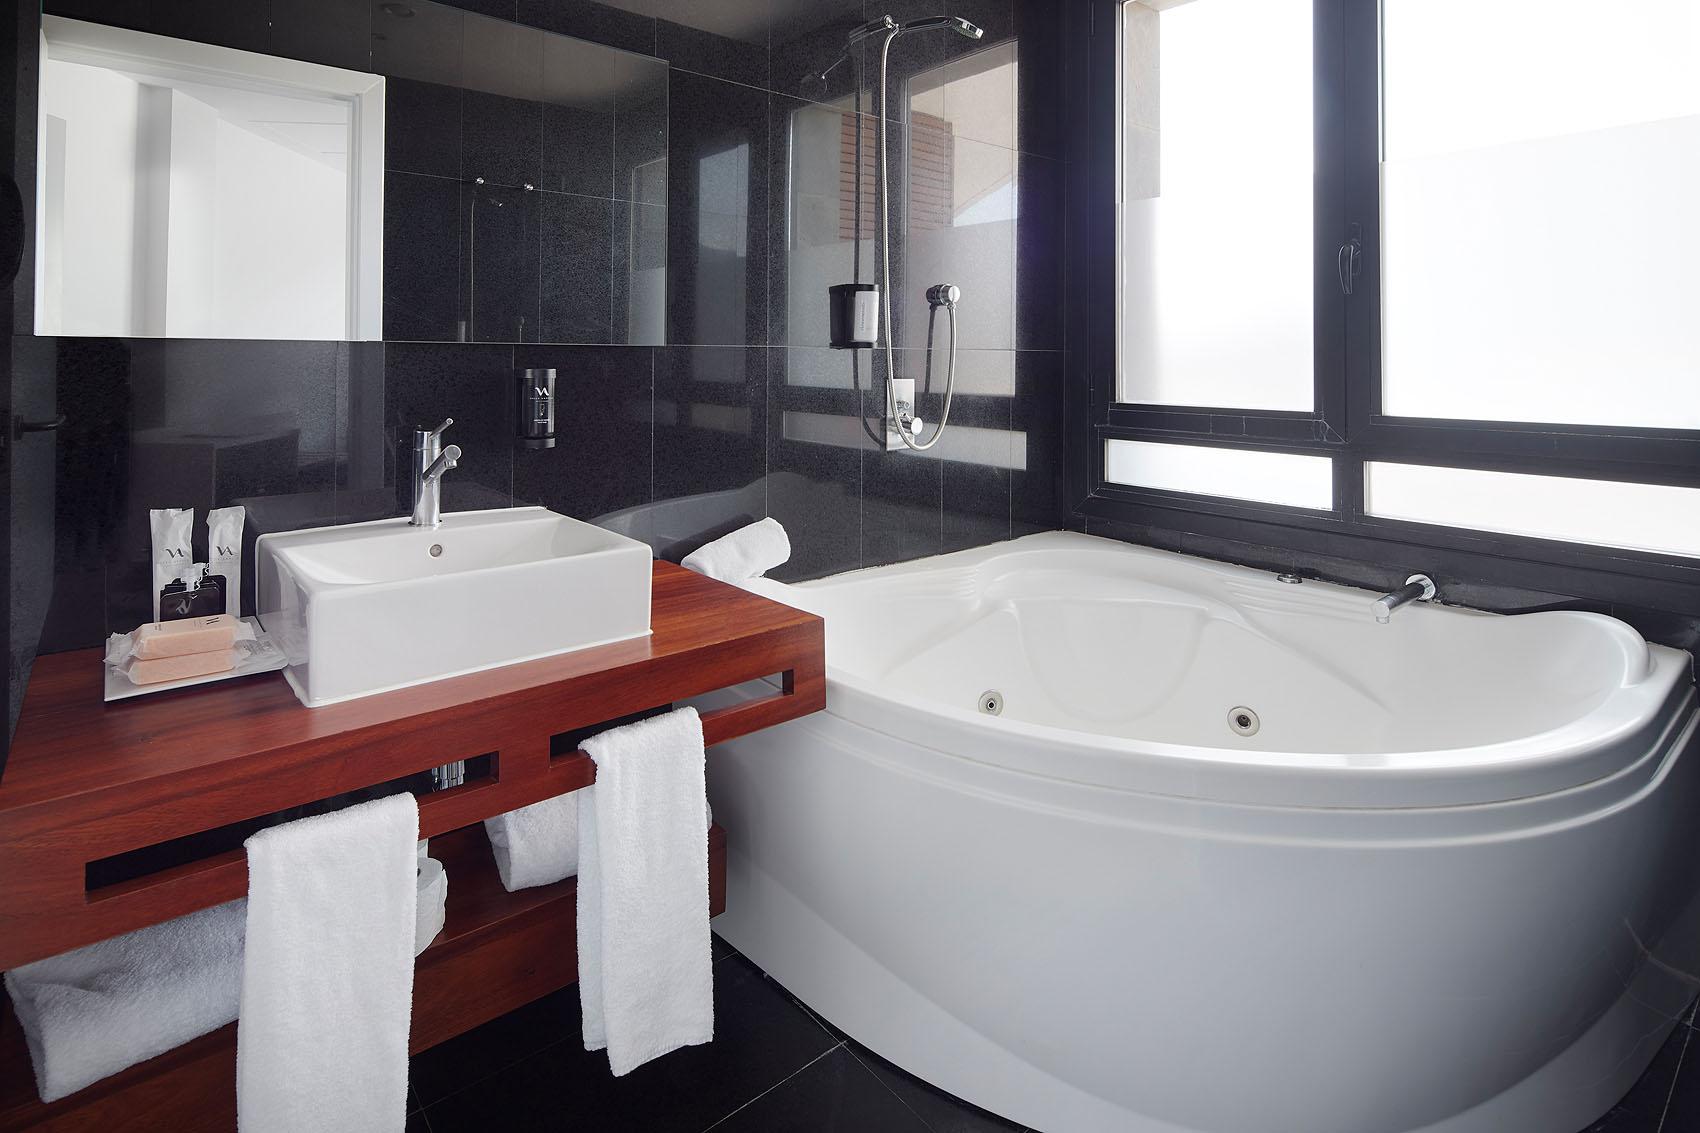 Villa Antilla Hotel & Talasoterapia - Iñaki Caperochipi - Fotografía